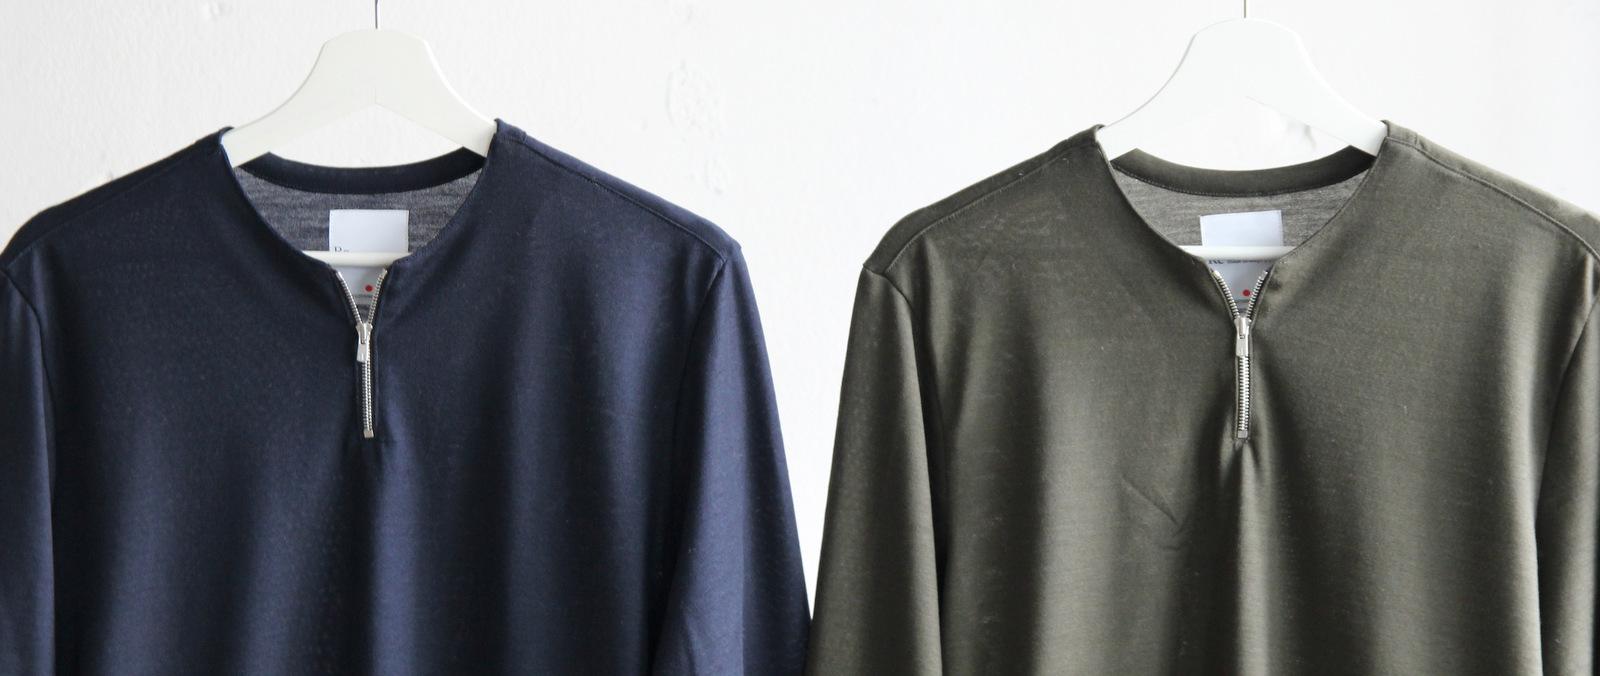 Merino Wool Knit Short Zip Pull Over_c0379477_18492011.jpg